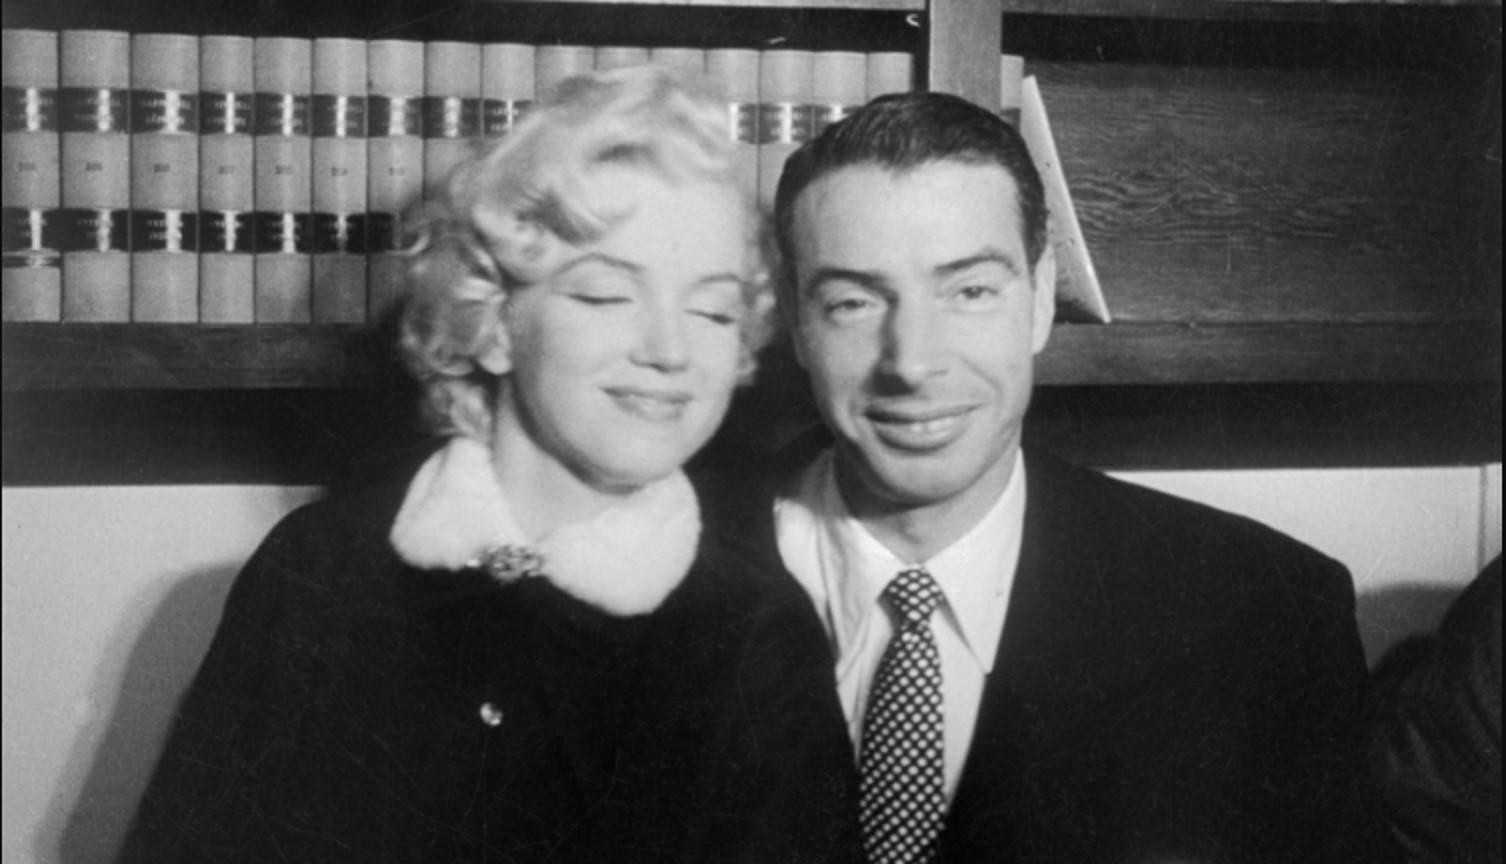 Marilyn Monroe bersama salah satu suaminya, Joe DiMaggio (E!)